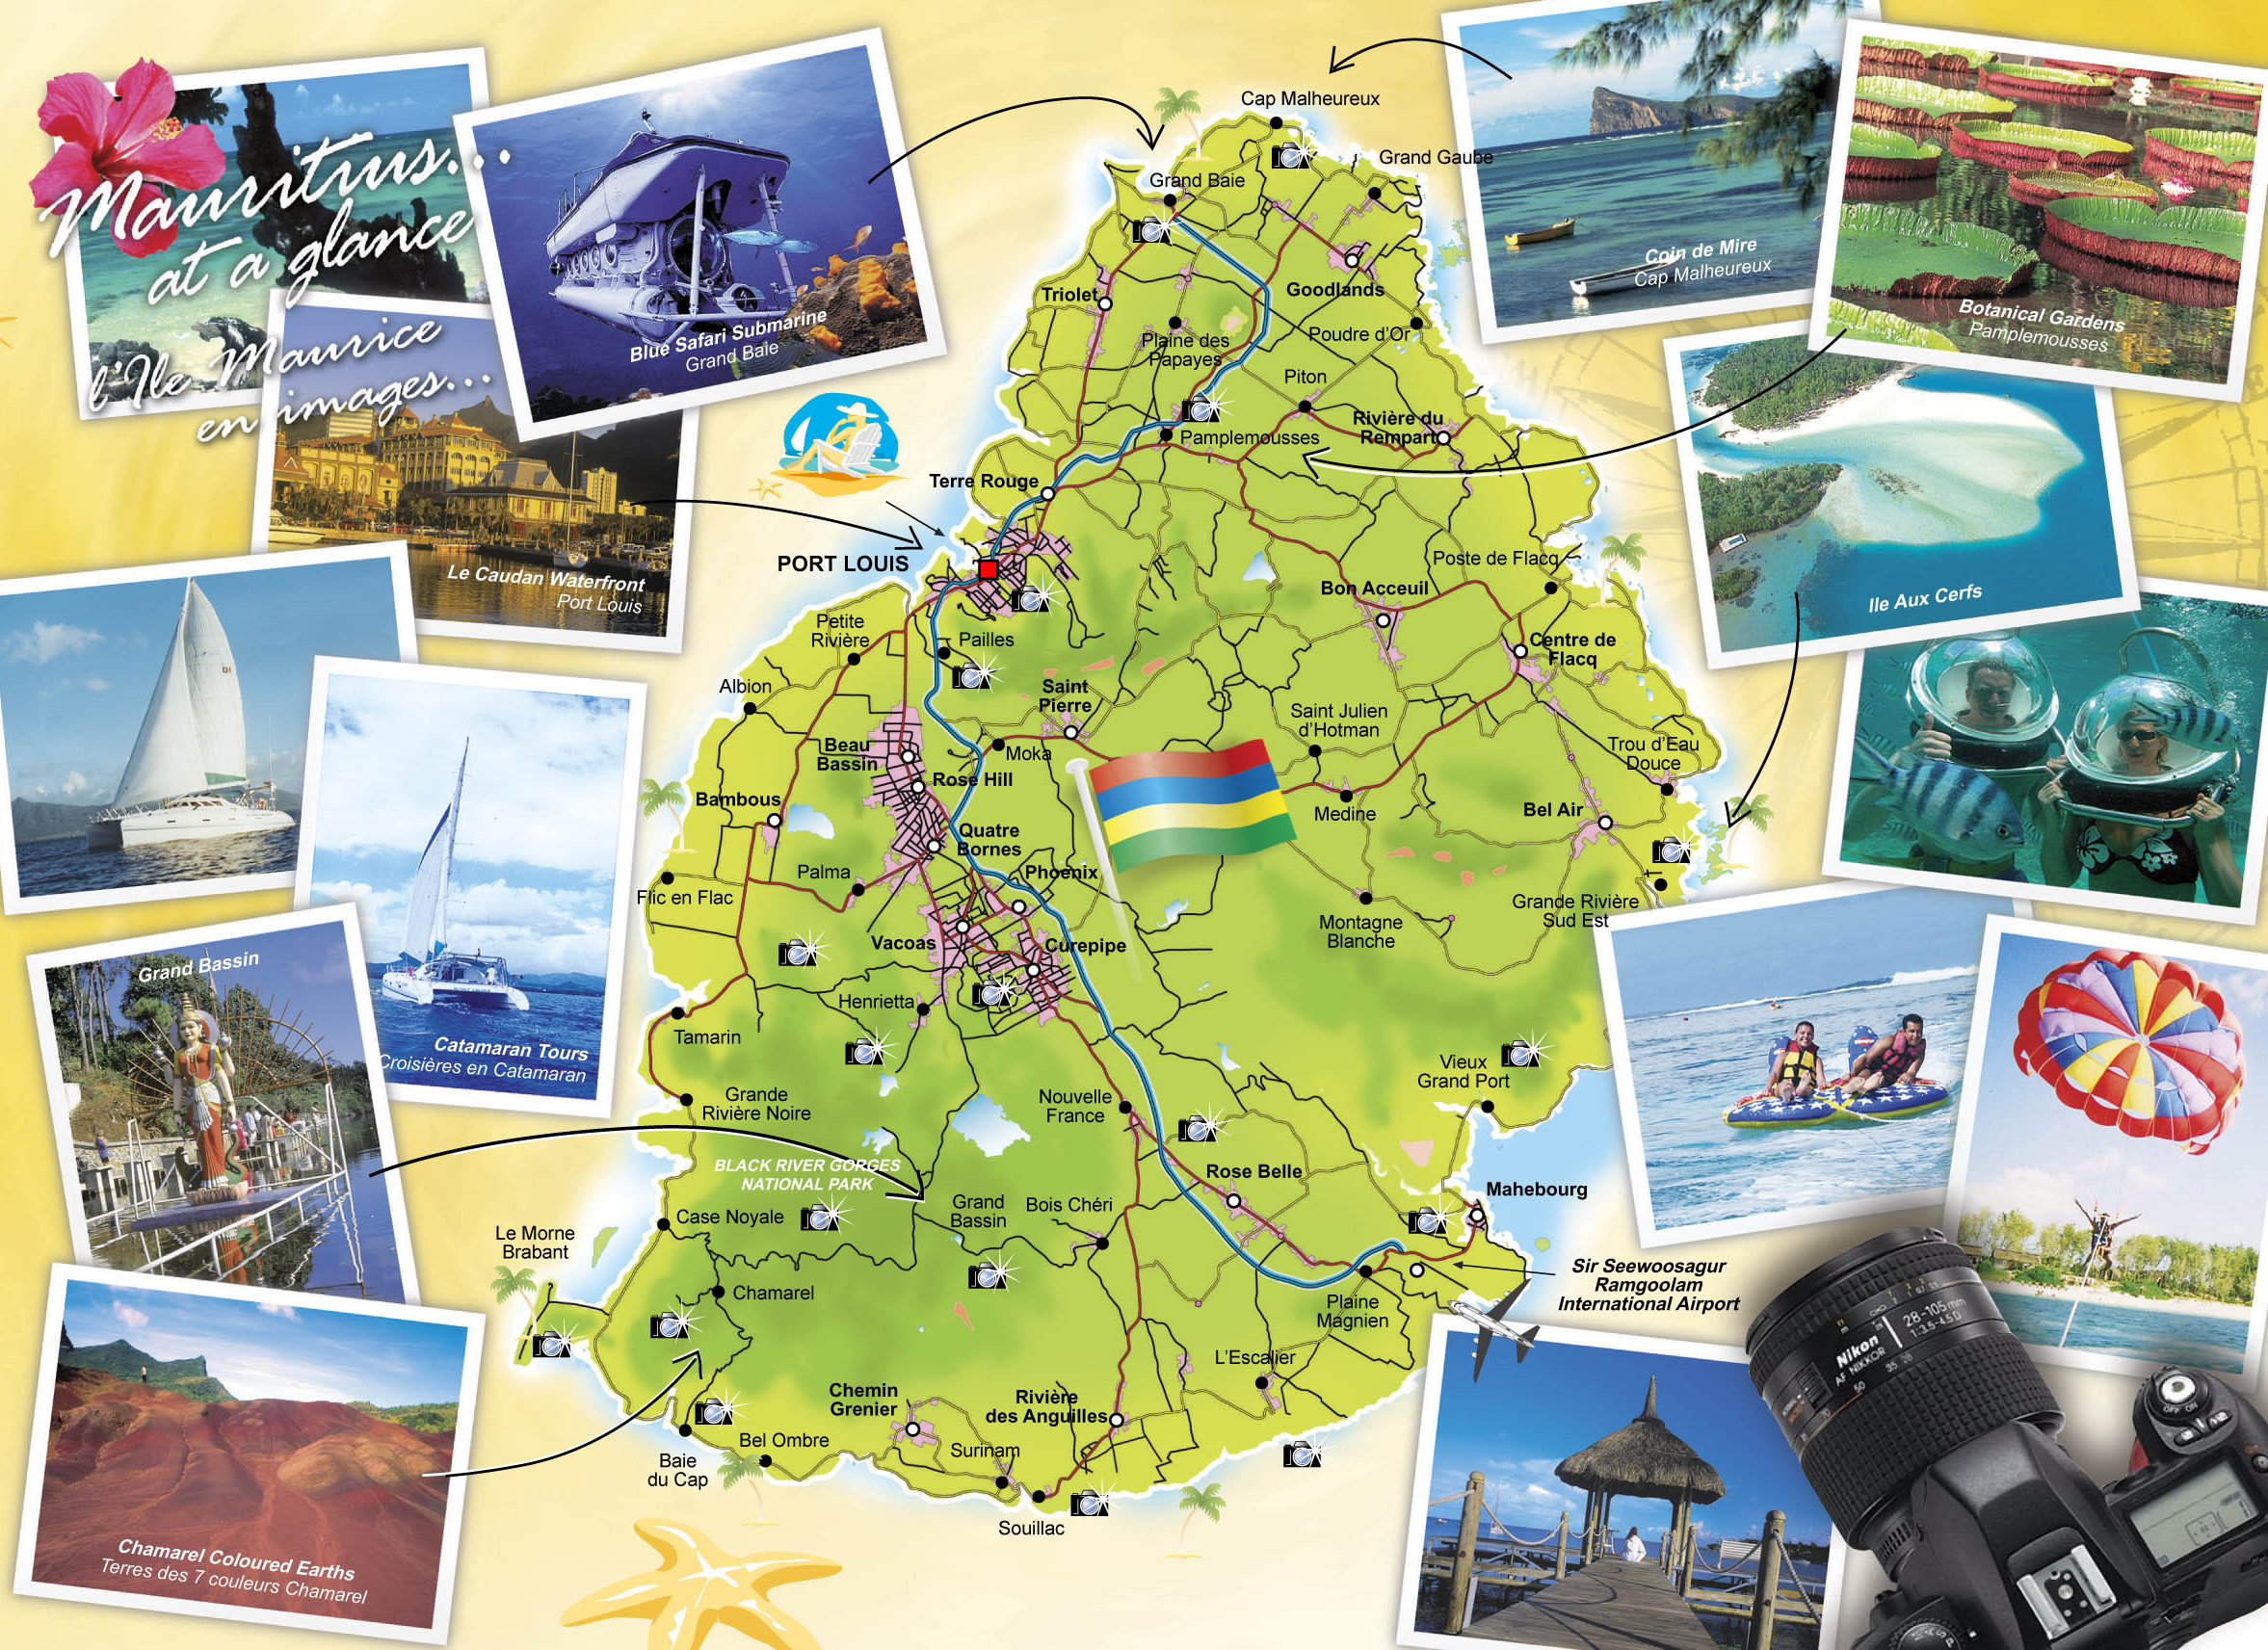 Mauritius Tourist Map Mauritius Mappery - Detailed map of mauritius